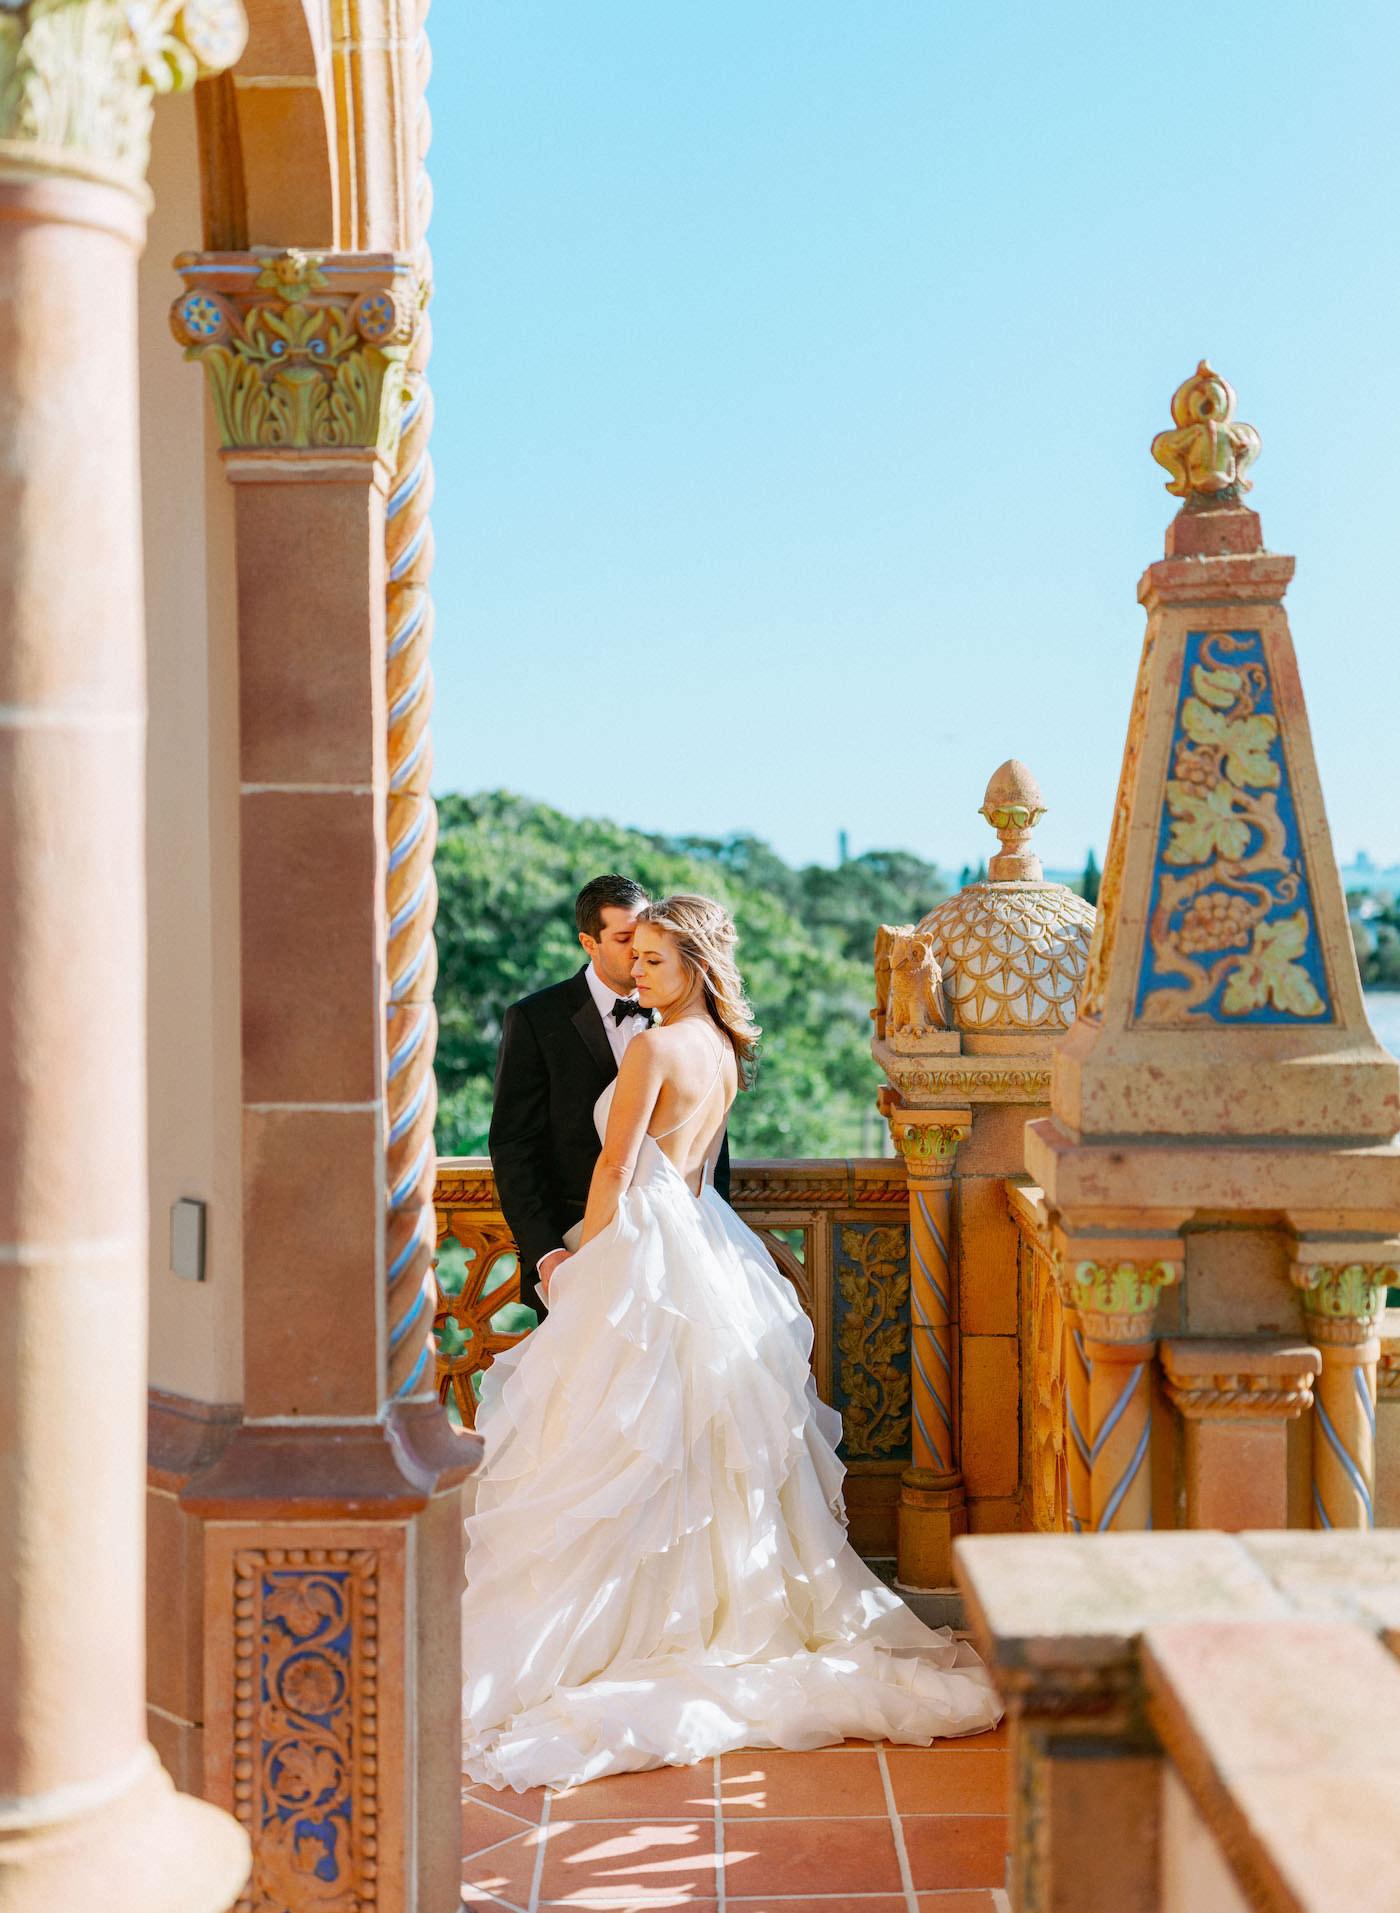 Romantic, Modern Florida Bride and Groom At Ca' d'Zan Ringling Mansion Belvedere Tower | Sarasota Wedding Planner NK Weddings